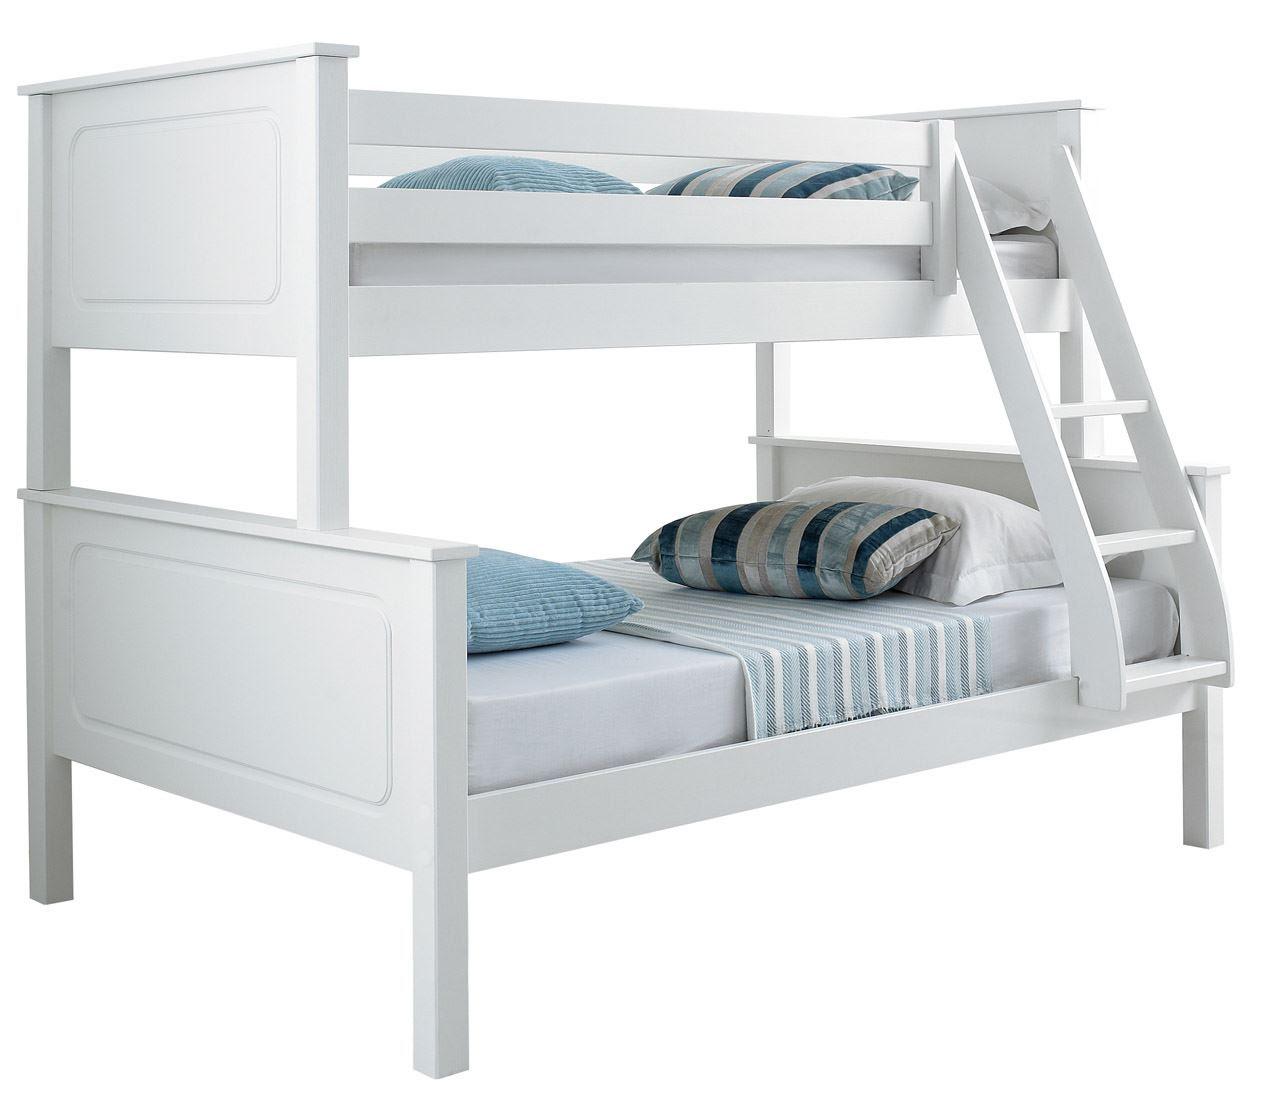 Happy Beds Vancouver 4FT Bunk Bed Triple Sleeper Solid Pine Mattresses  eBay